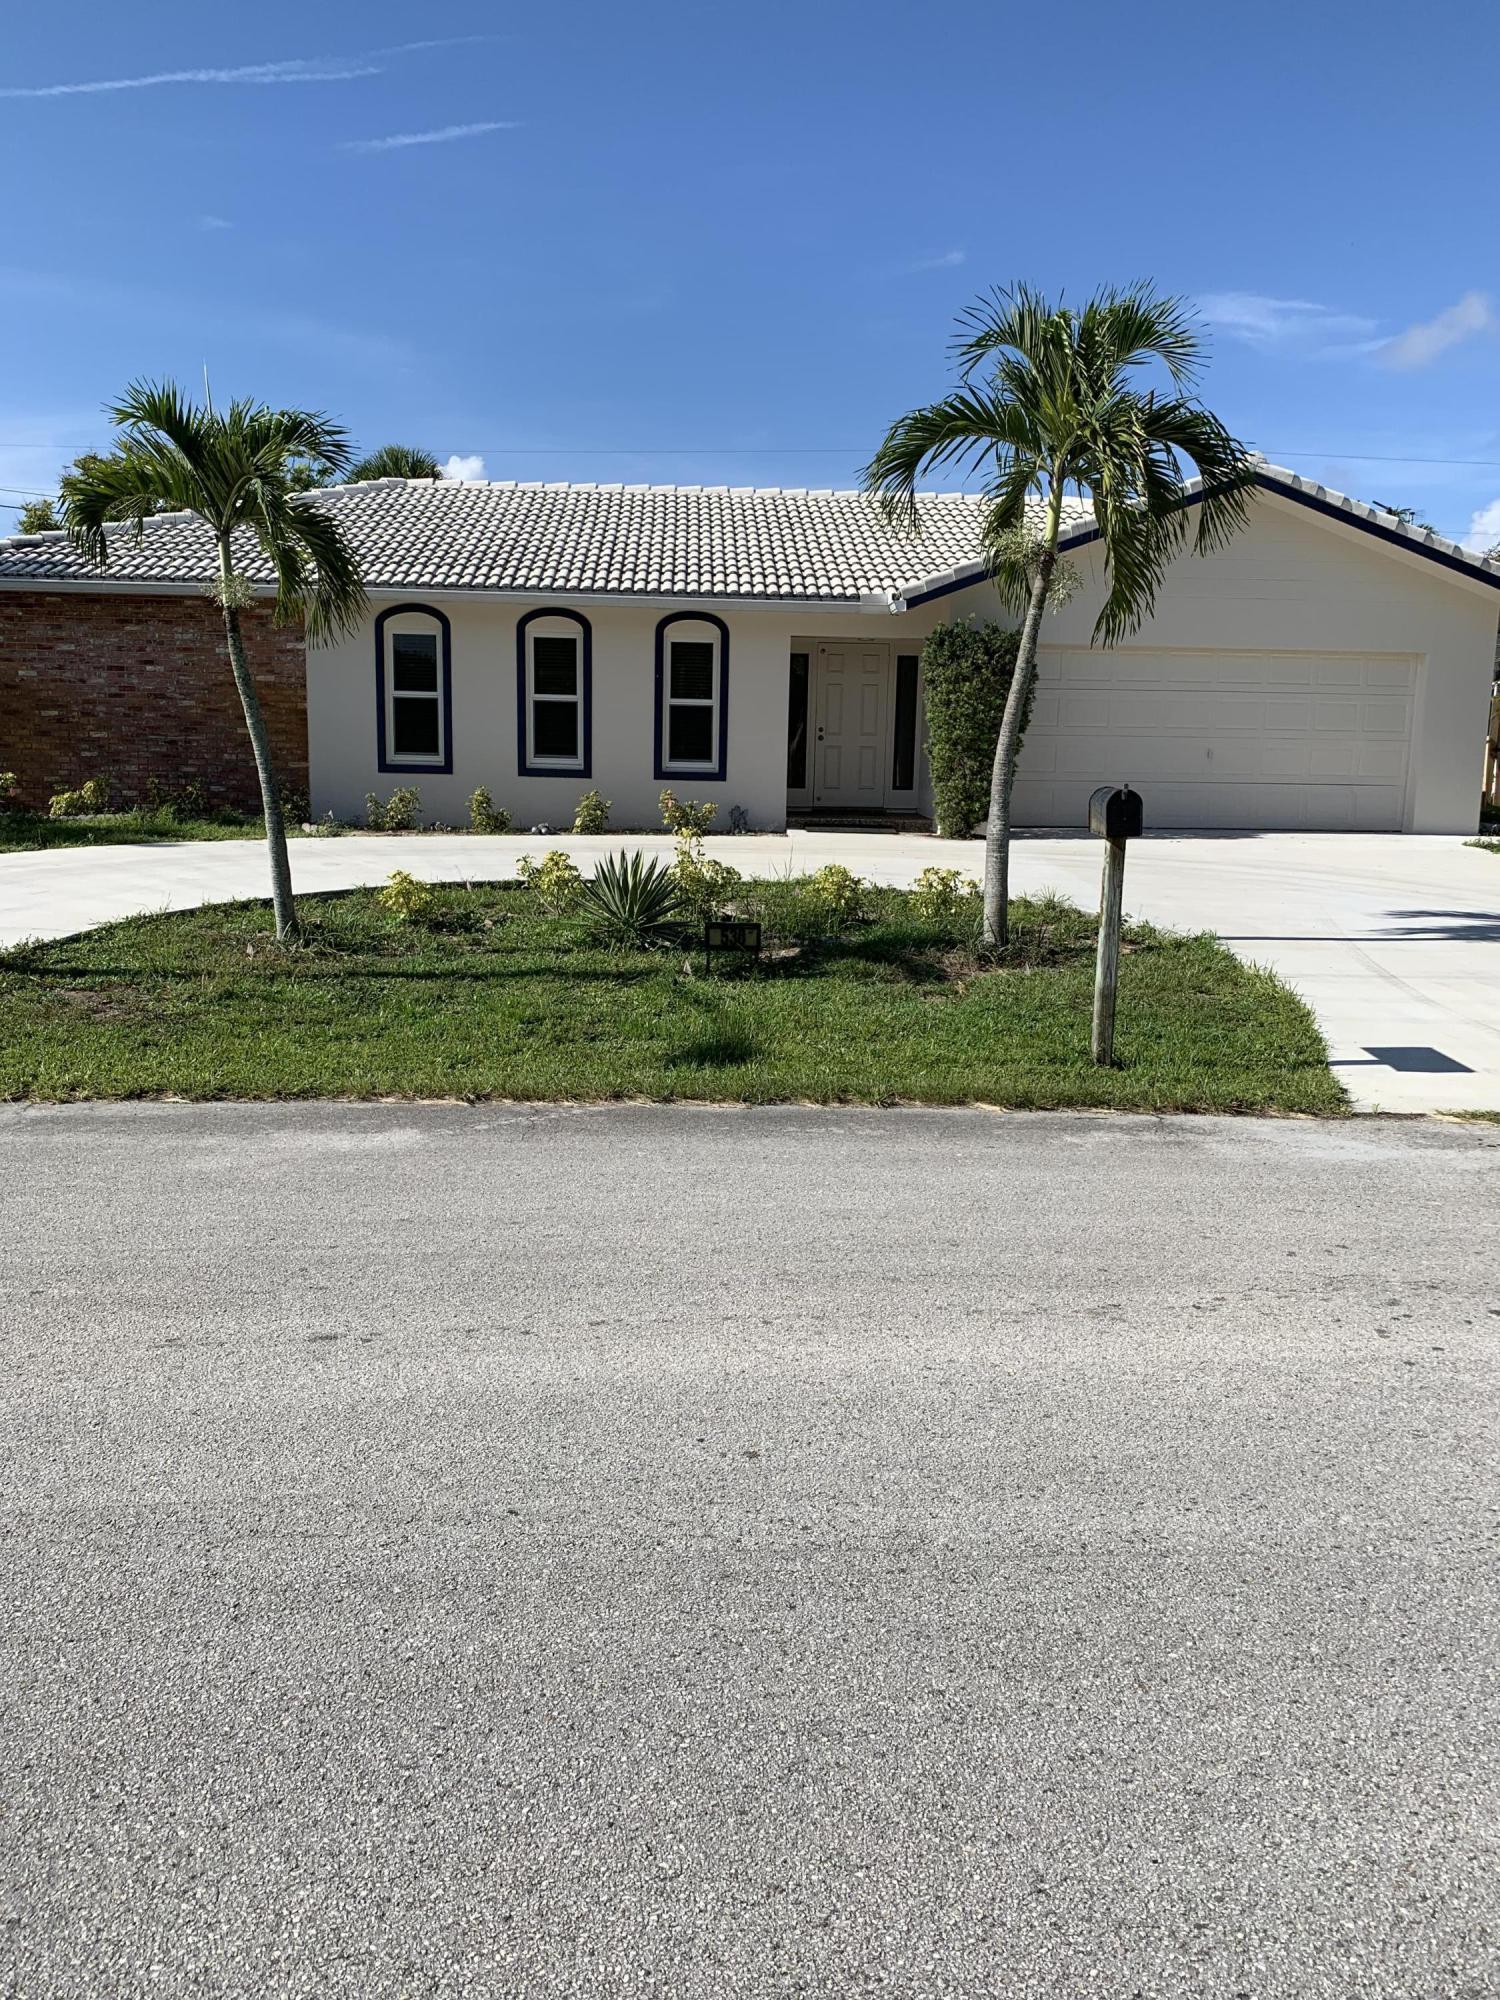 530 Nw 46 Street Boca Raton, FL 33431